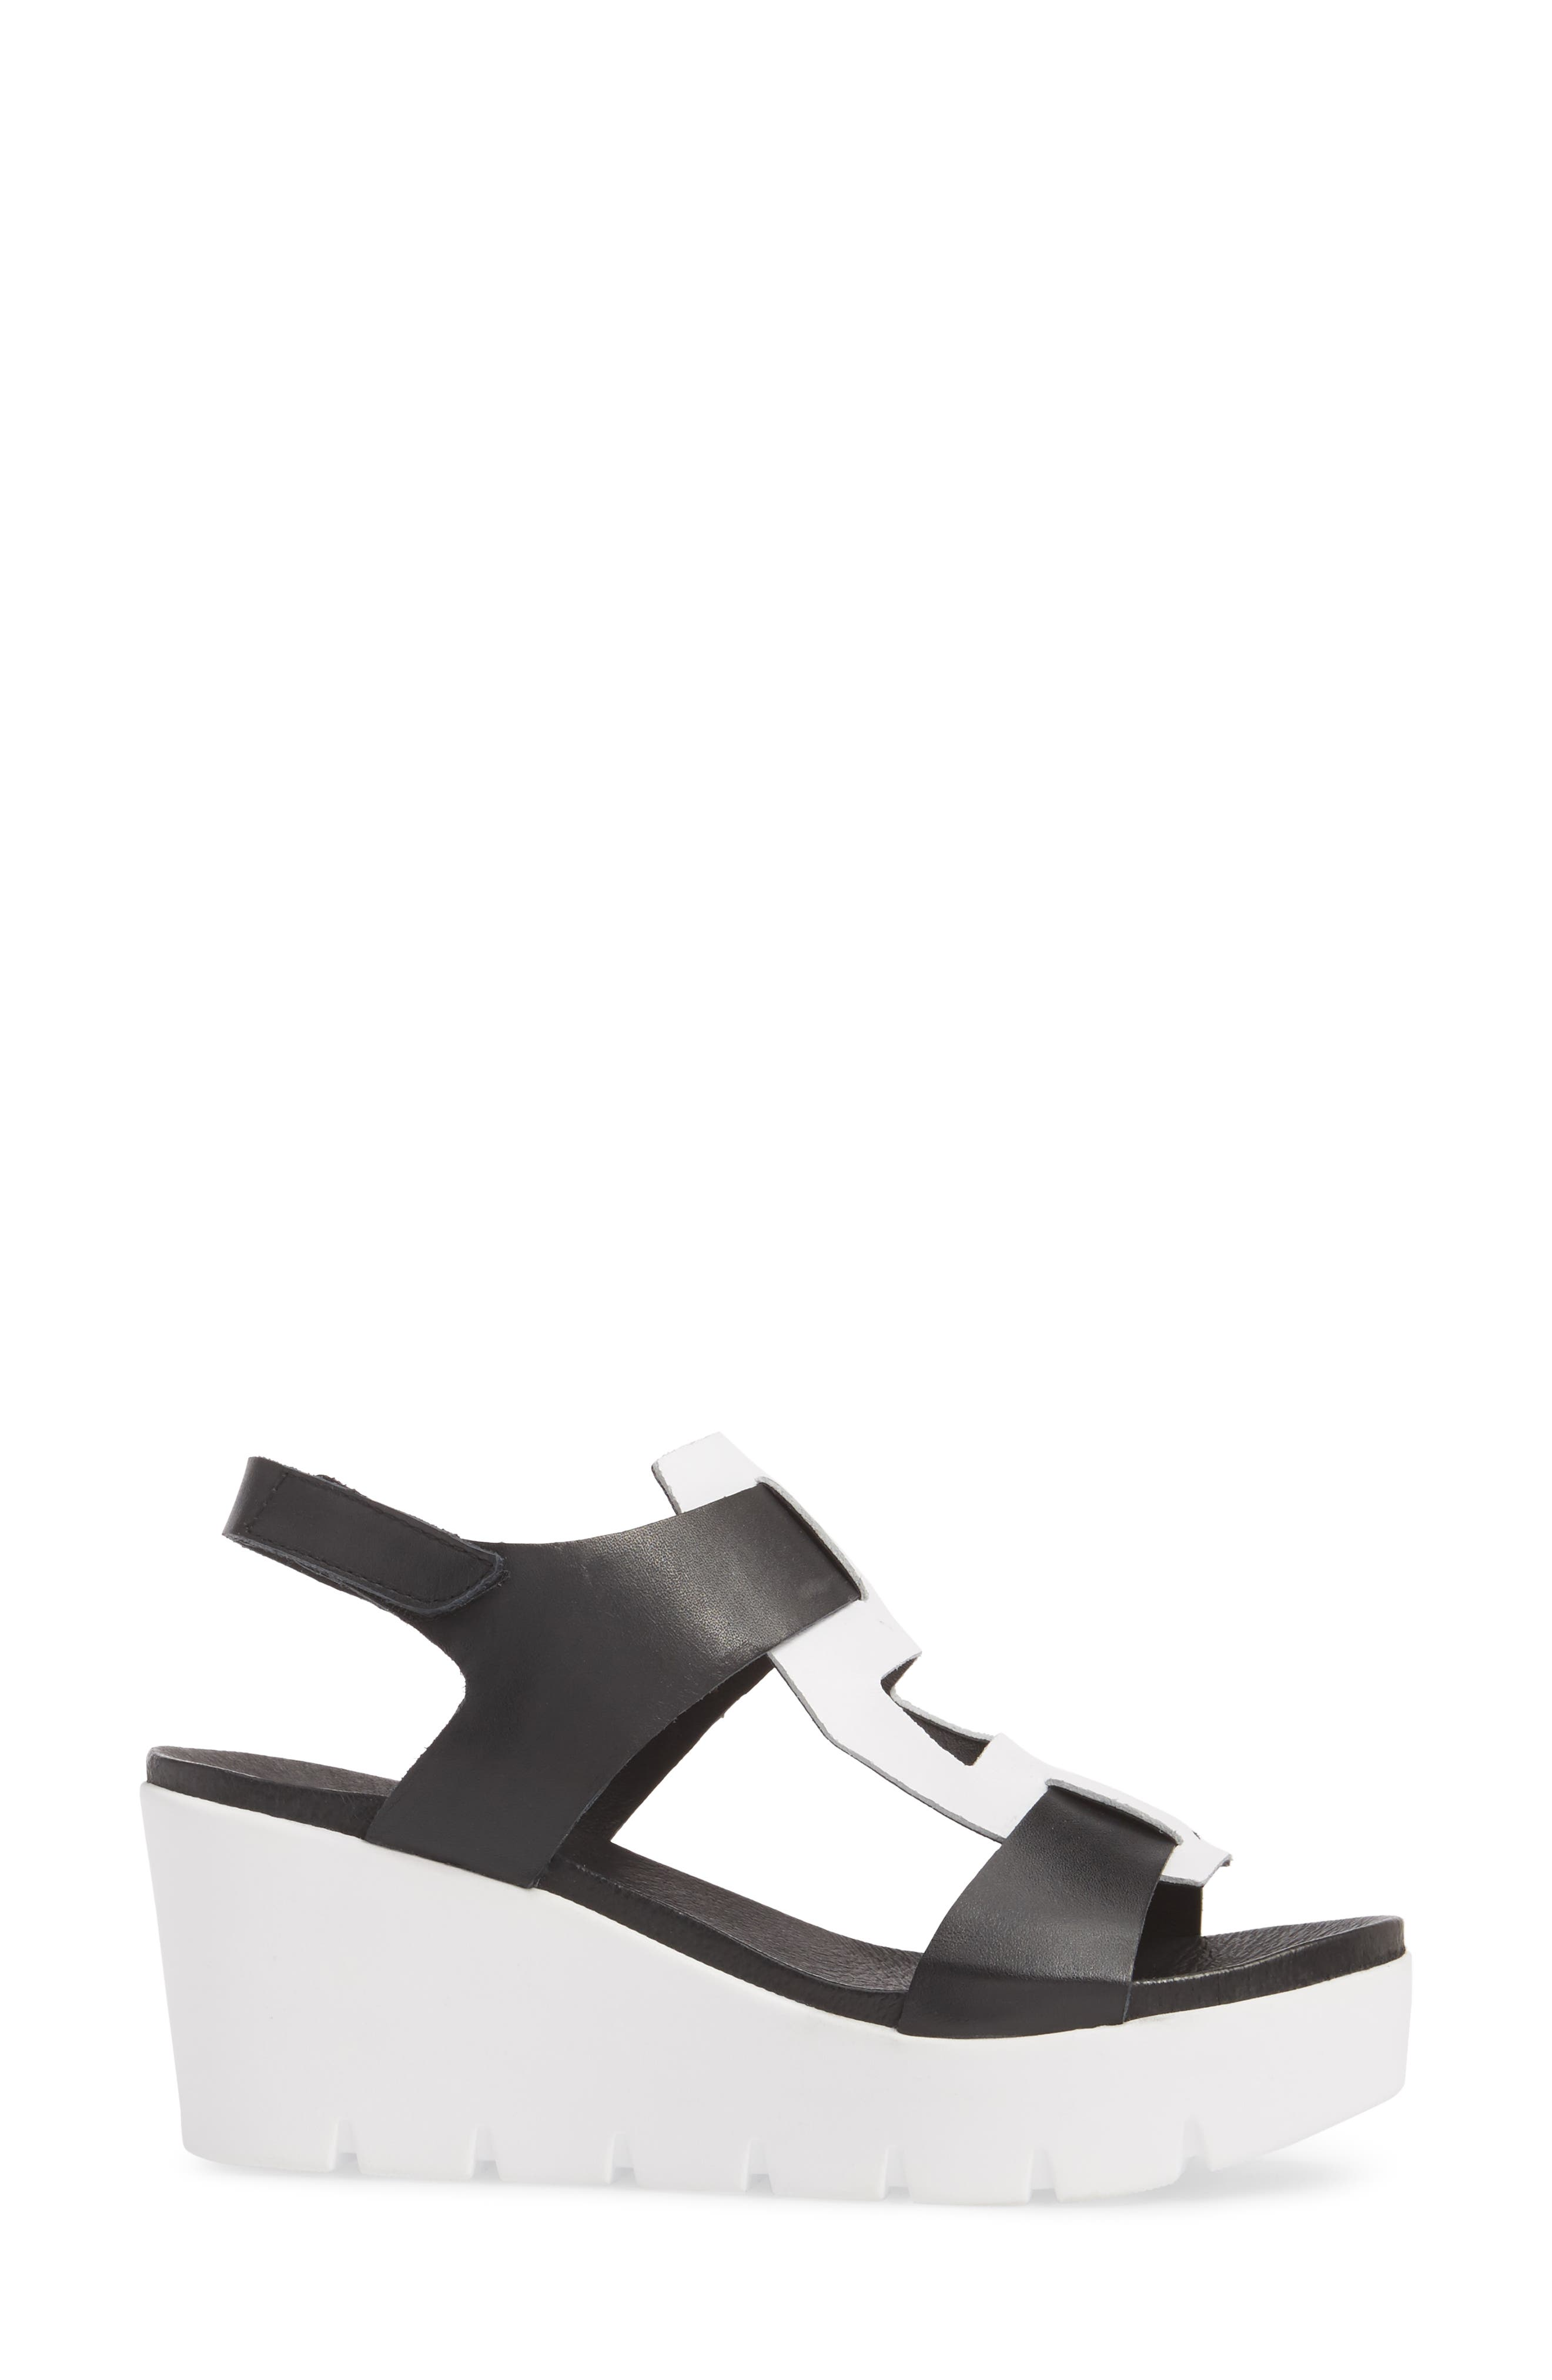 Somo Platform Wedge Sandal,                             Alternate thumbnail 3, color,                             BLACK/ WHITE SMOOTH LEATHER